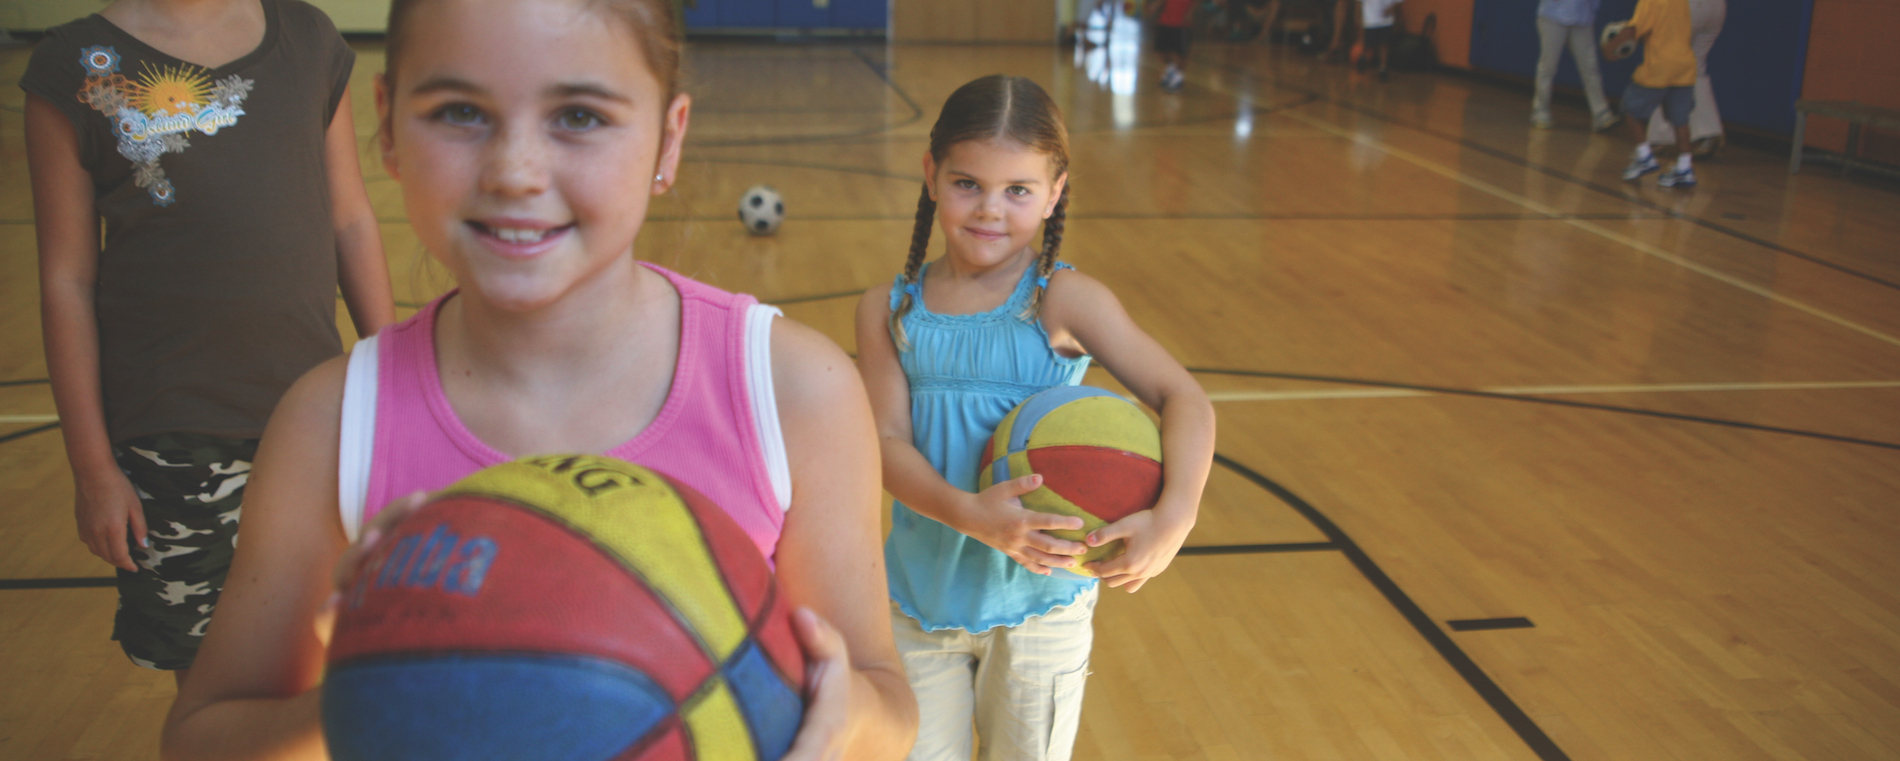 Dave Miller Basketball Clinic